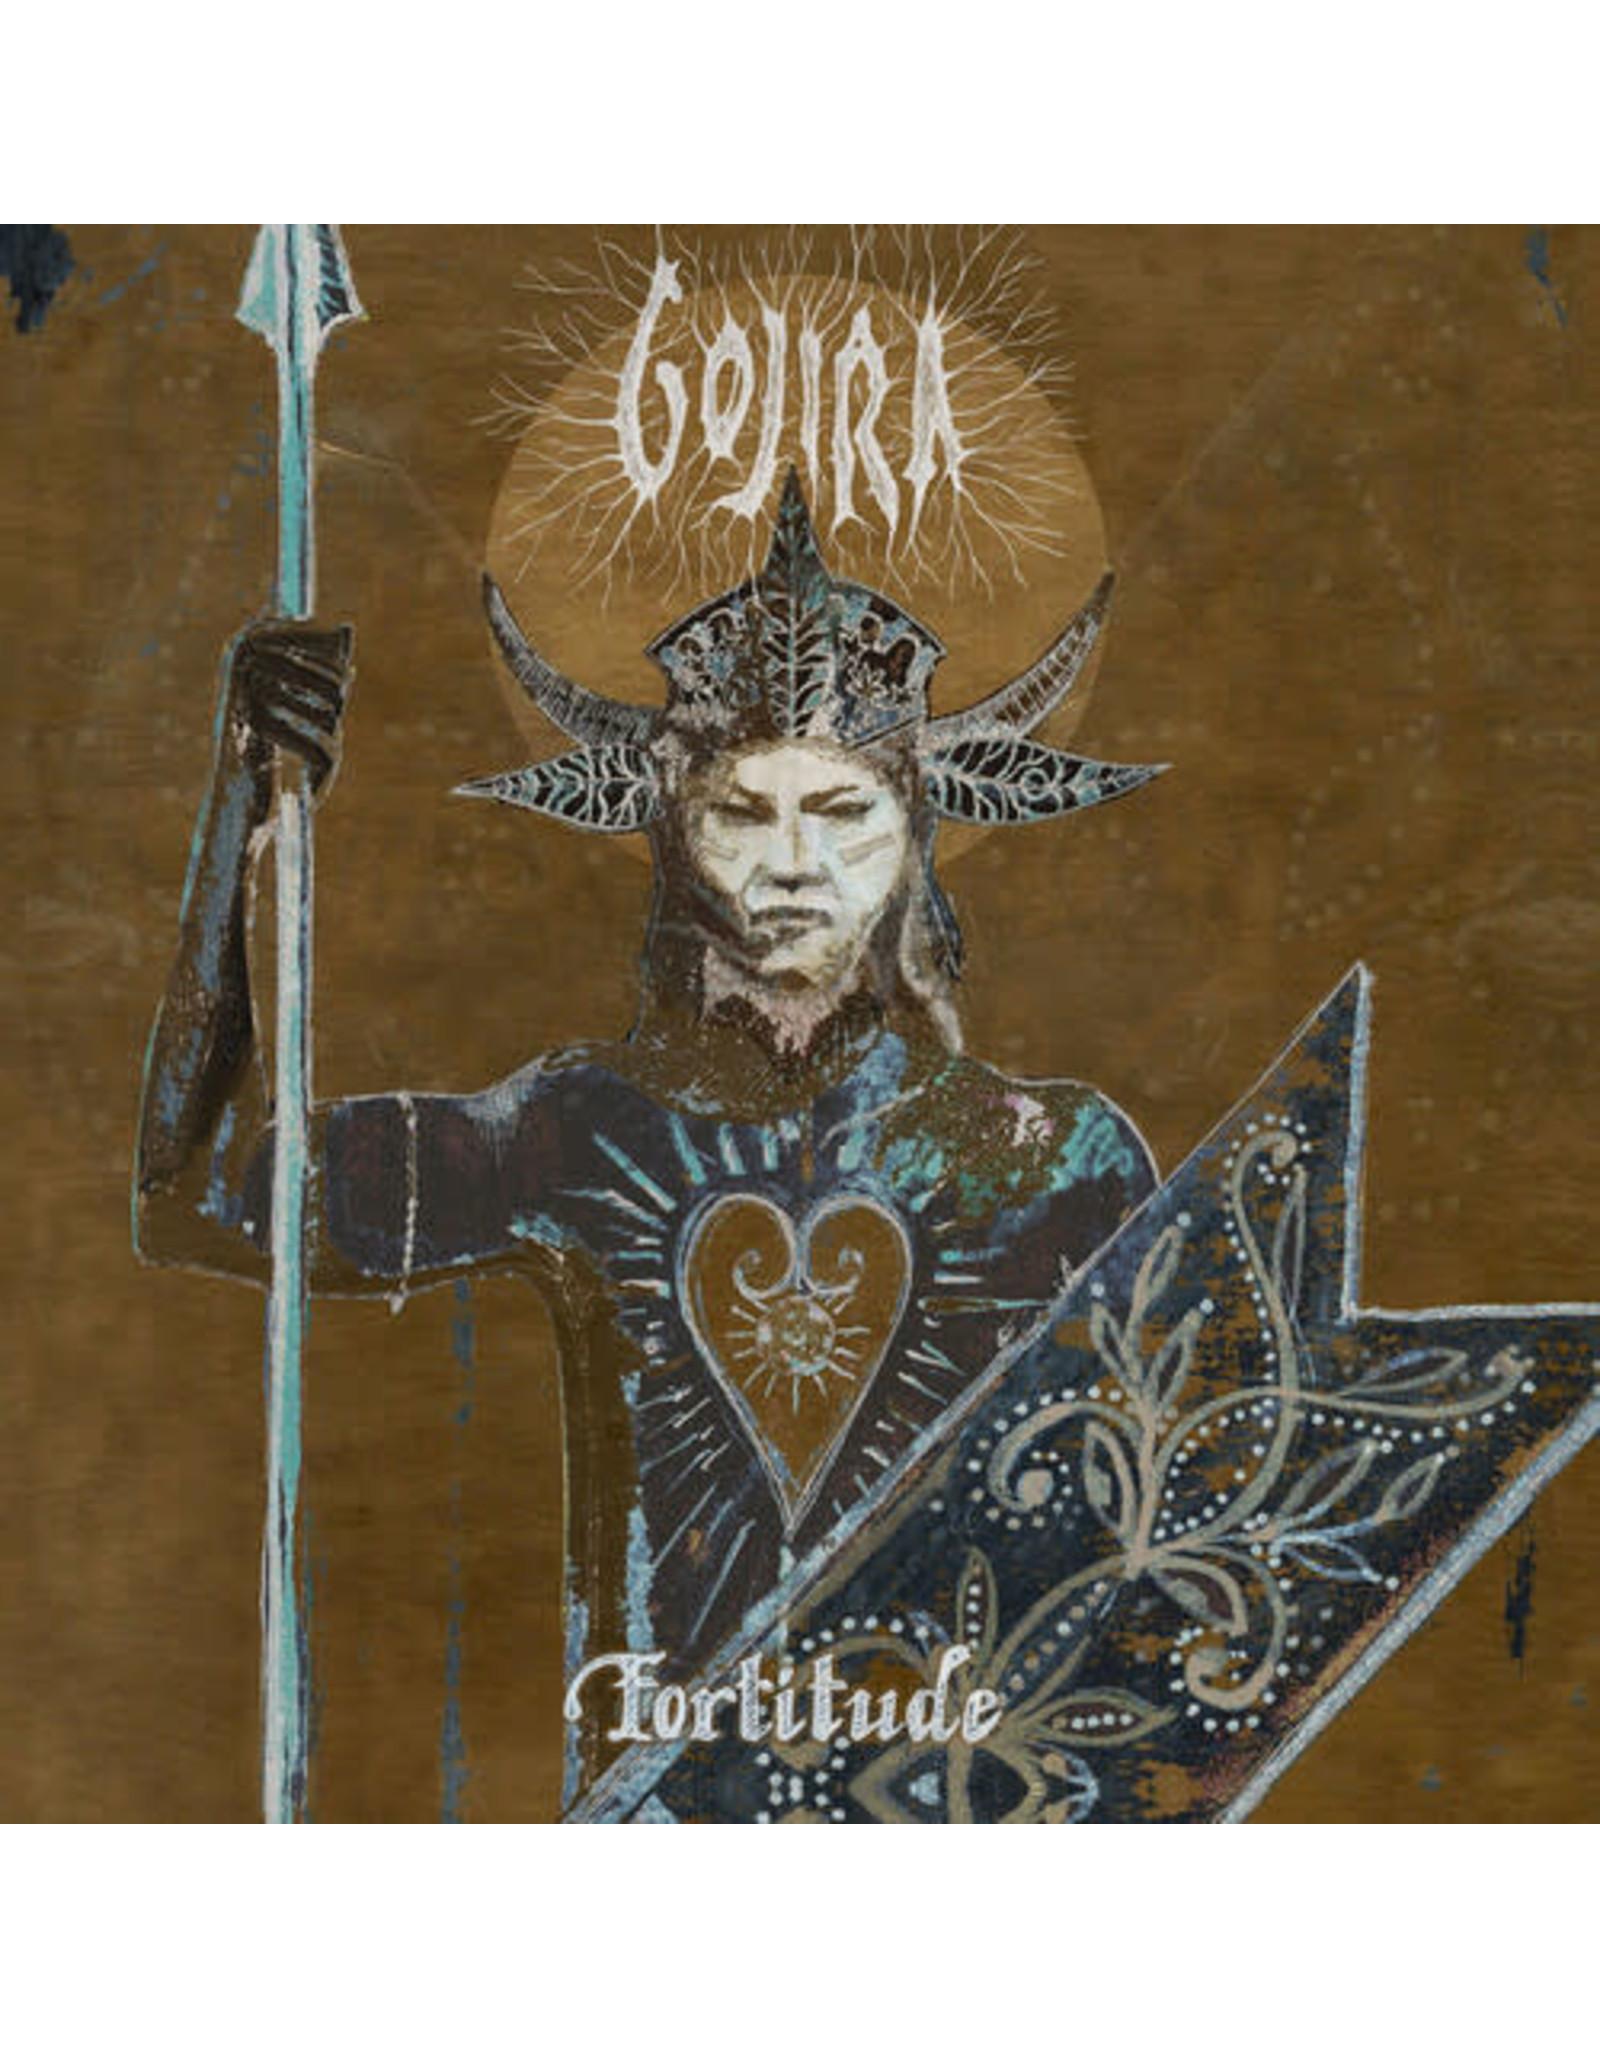 New Vinyl Gojira - Fortitude (Colored) LP